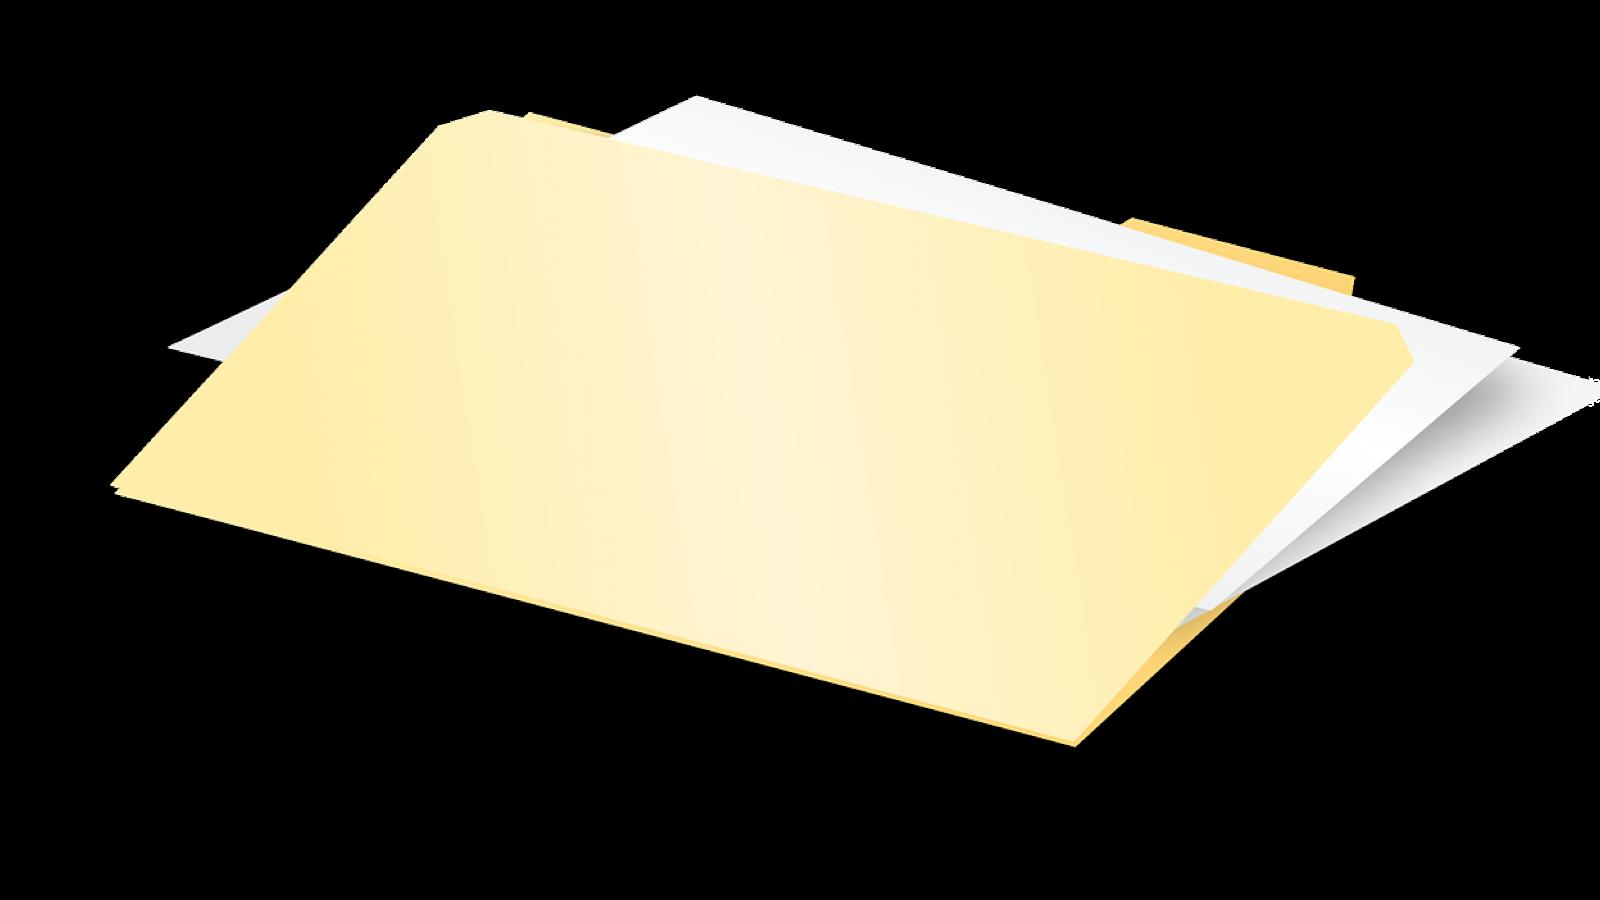 folder-146940_1280